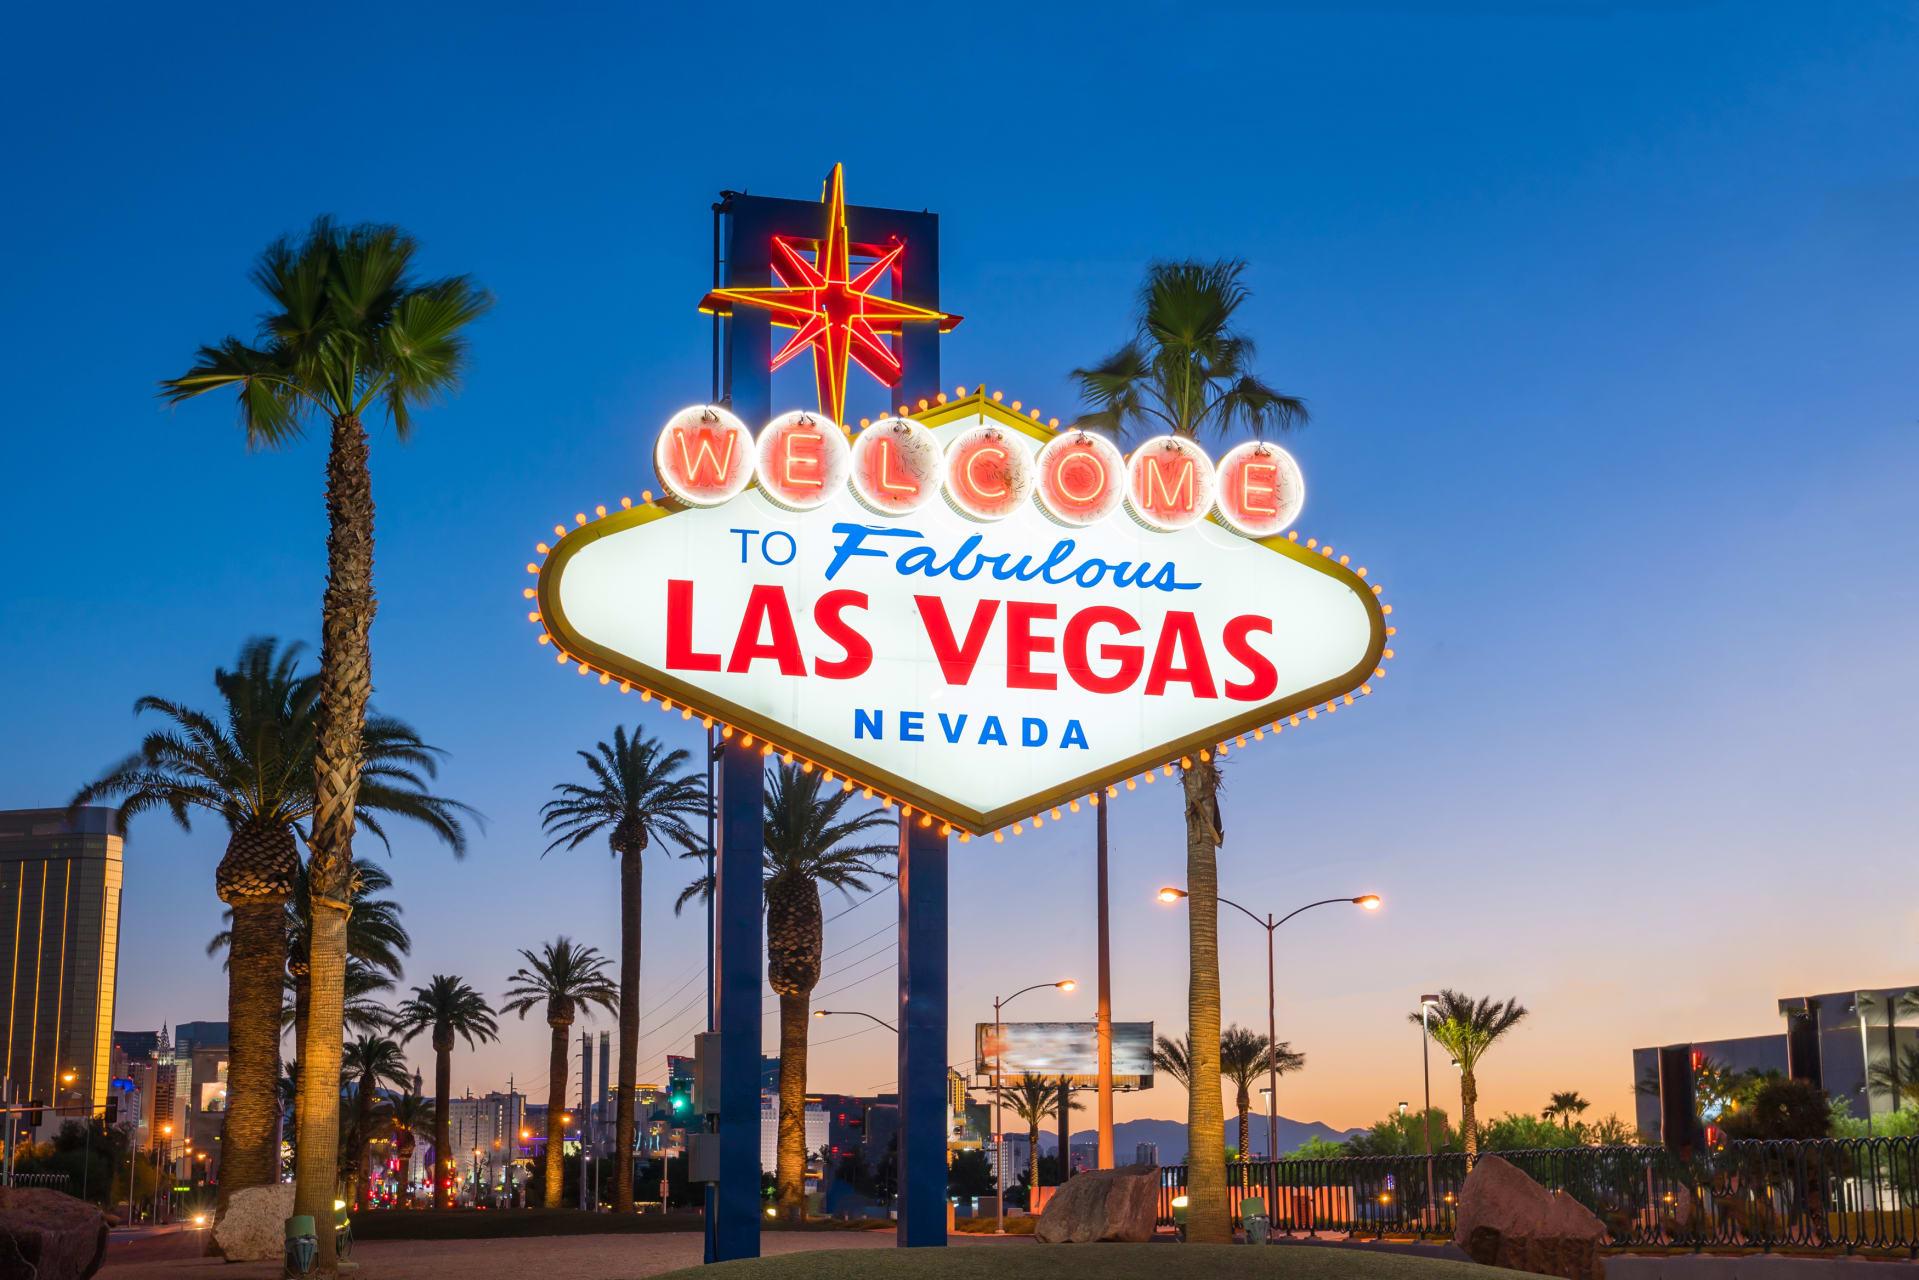 Las Vegas - Trending on the Las Vegas Strip